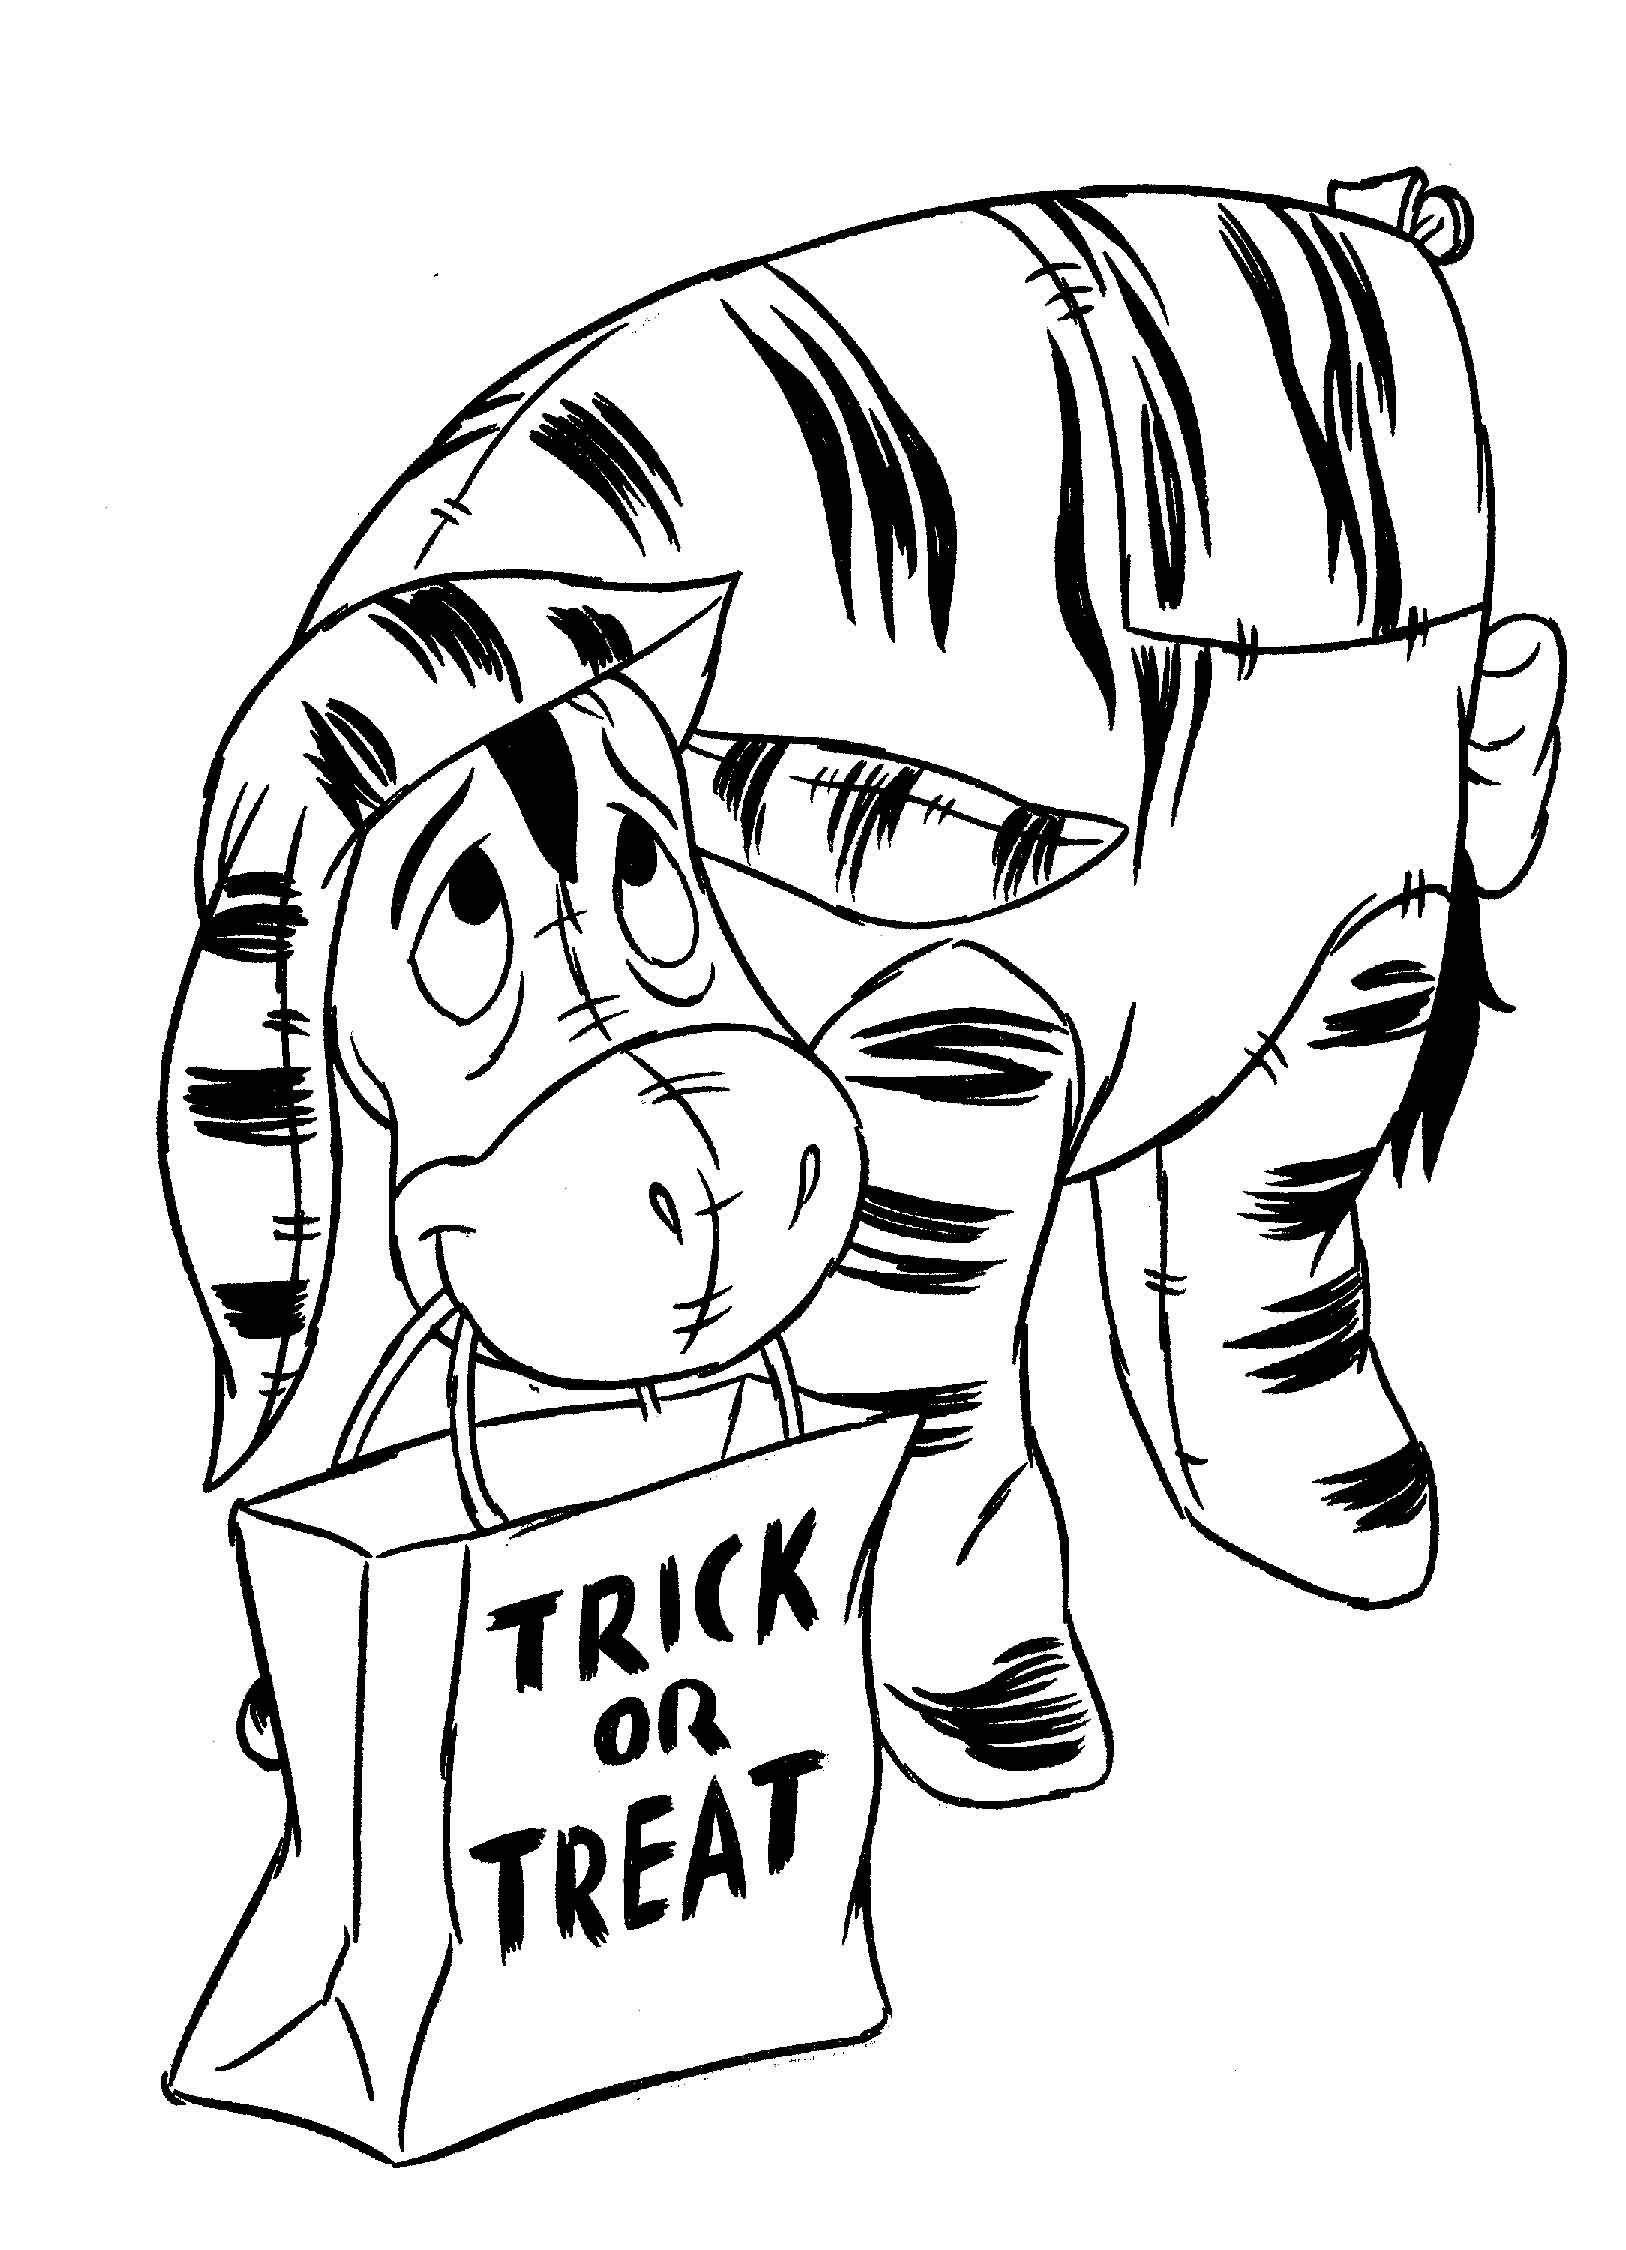 Coloring page halloween winnie de pooh and eeyore megus color